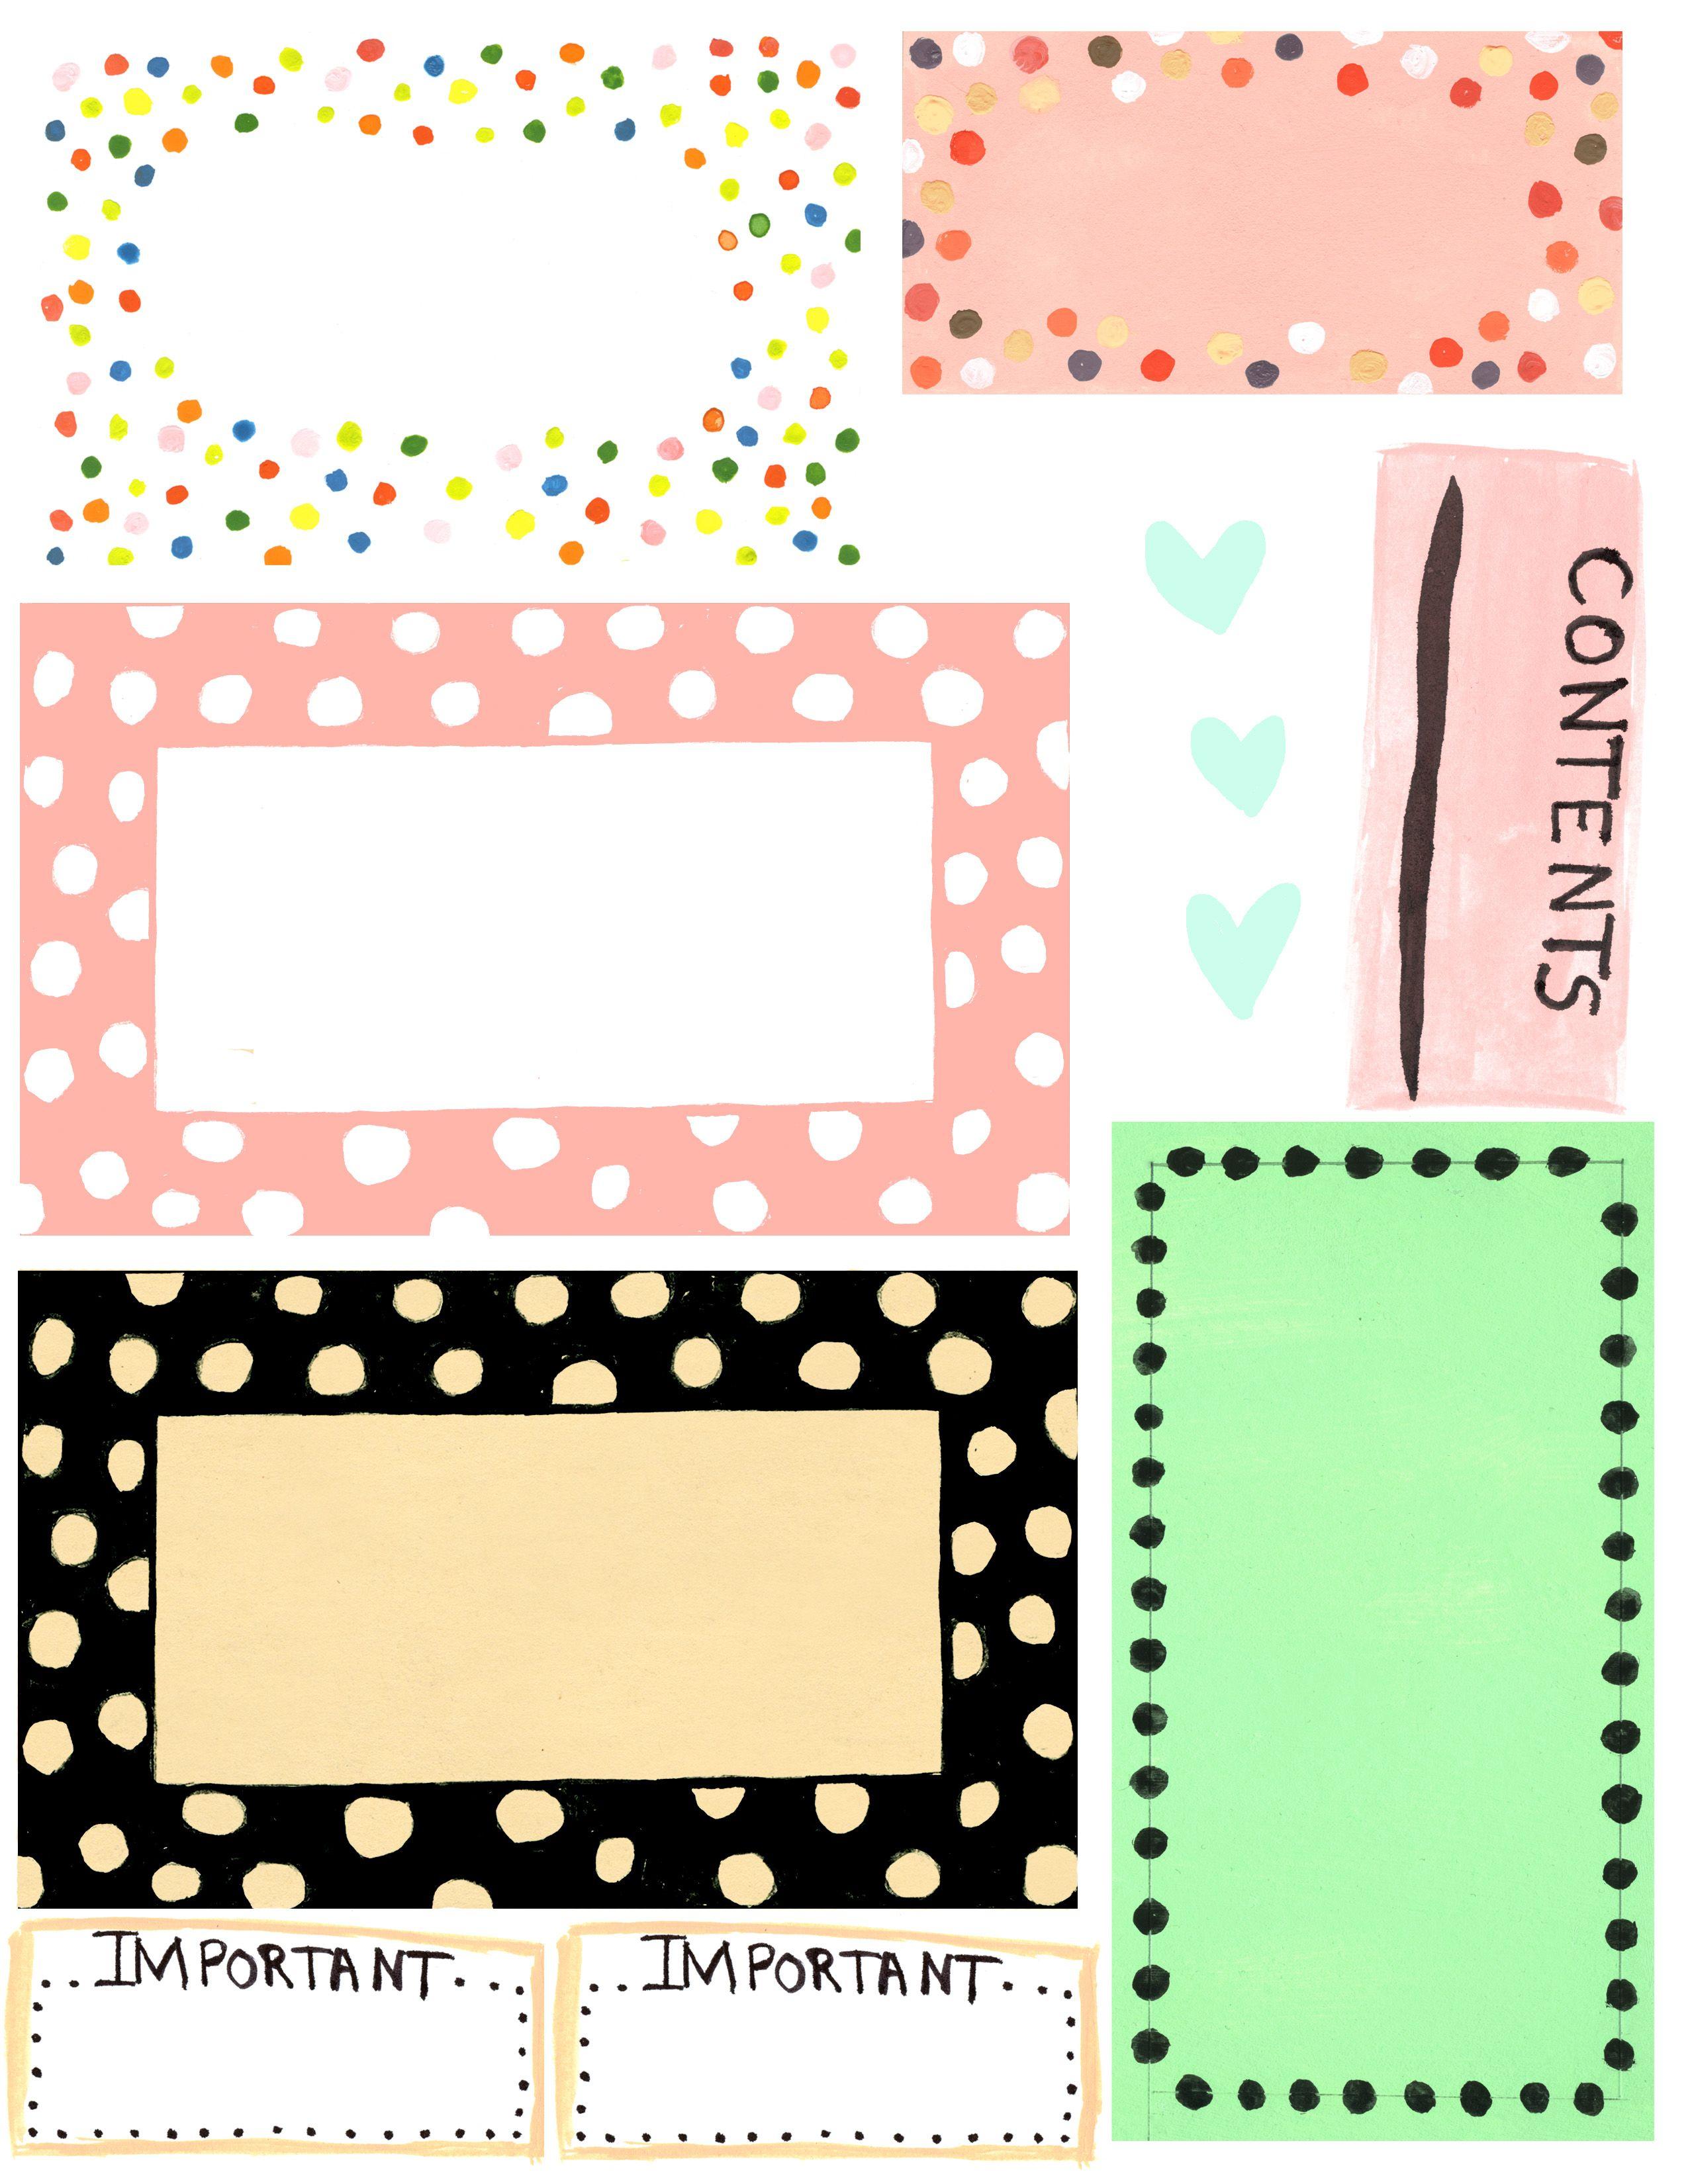 Free Printable Label Design Template Cakepins | Free Printables - Free Editable Printable Labels